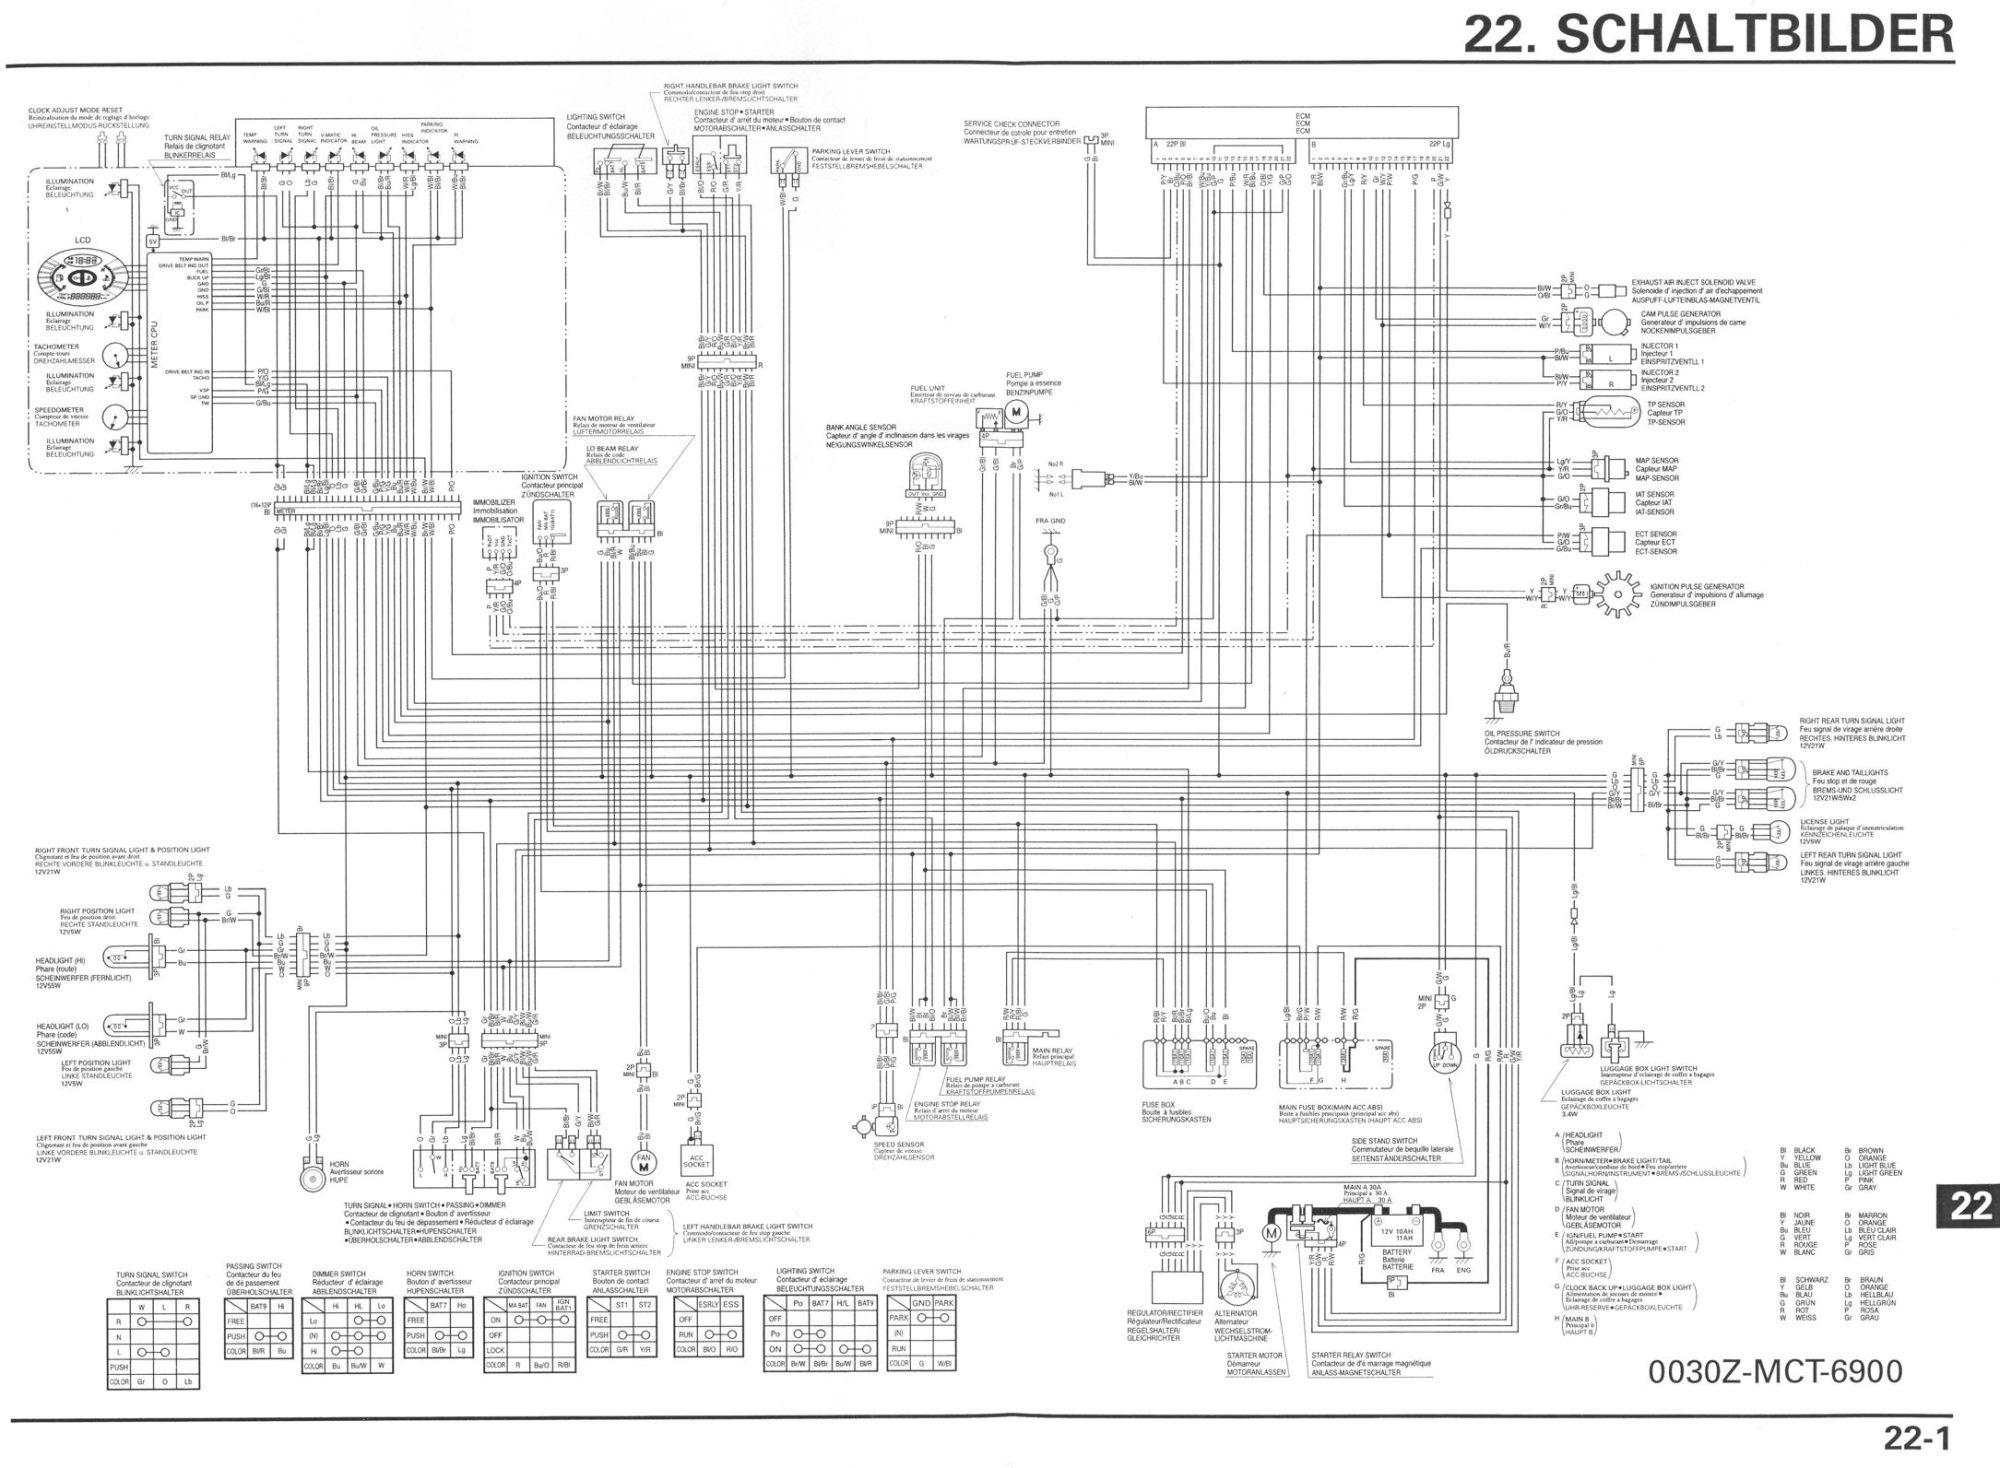 hight resolution of honda silver wing wiring diagram wiring library diagram h9 honda ruckus wiring diagram honda silver wing wiring diagram